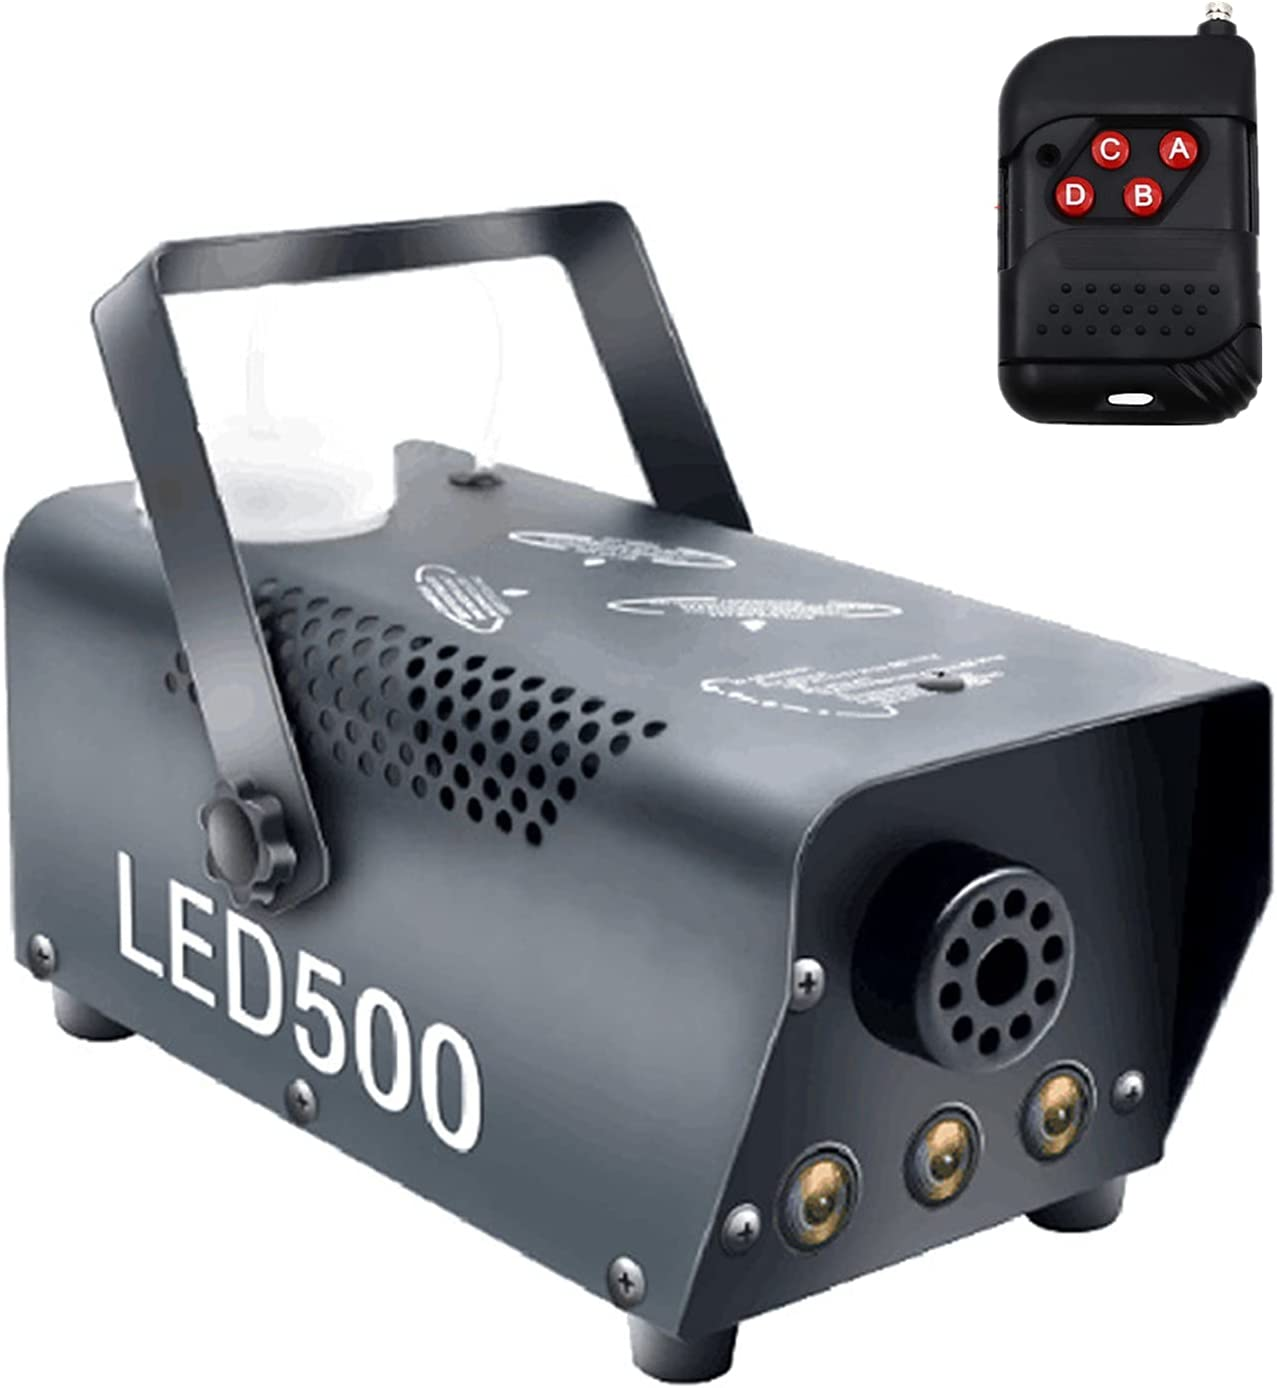 shop GAX Portable Fog Machine 500W Overseas parallel import regular item Professional W Smoke with